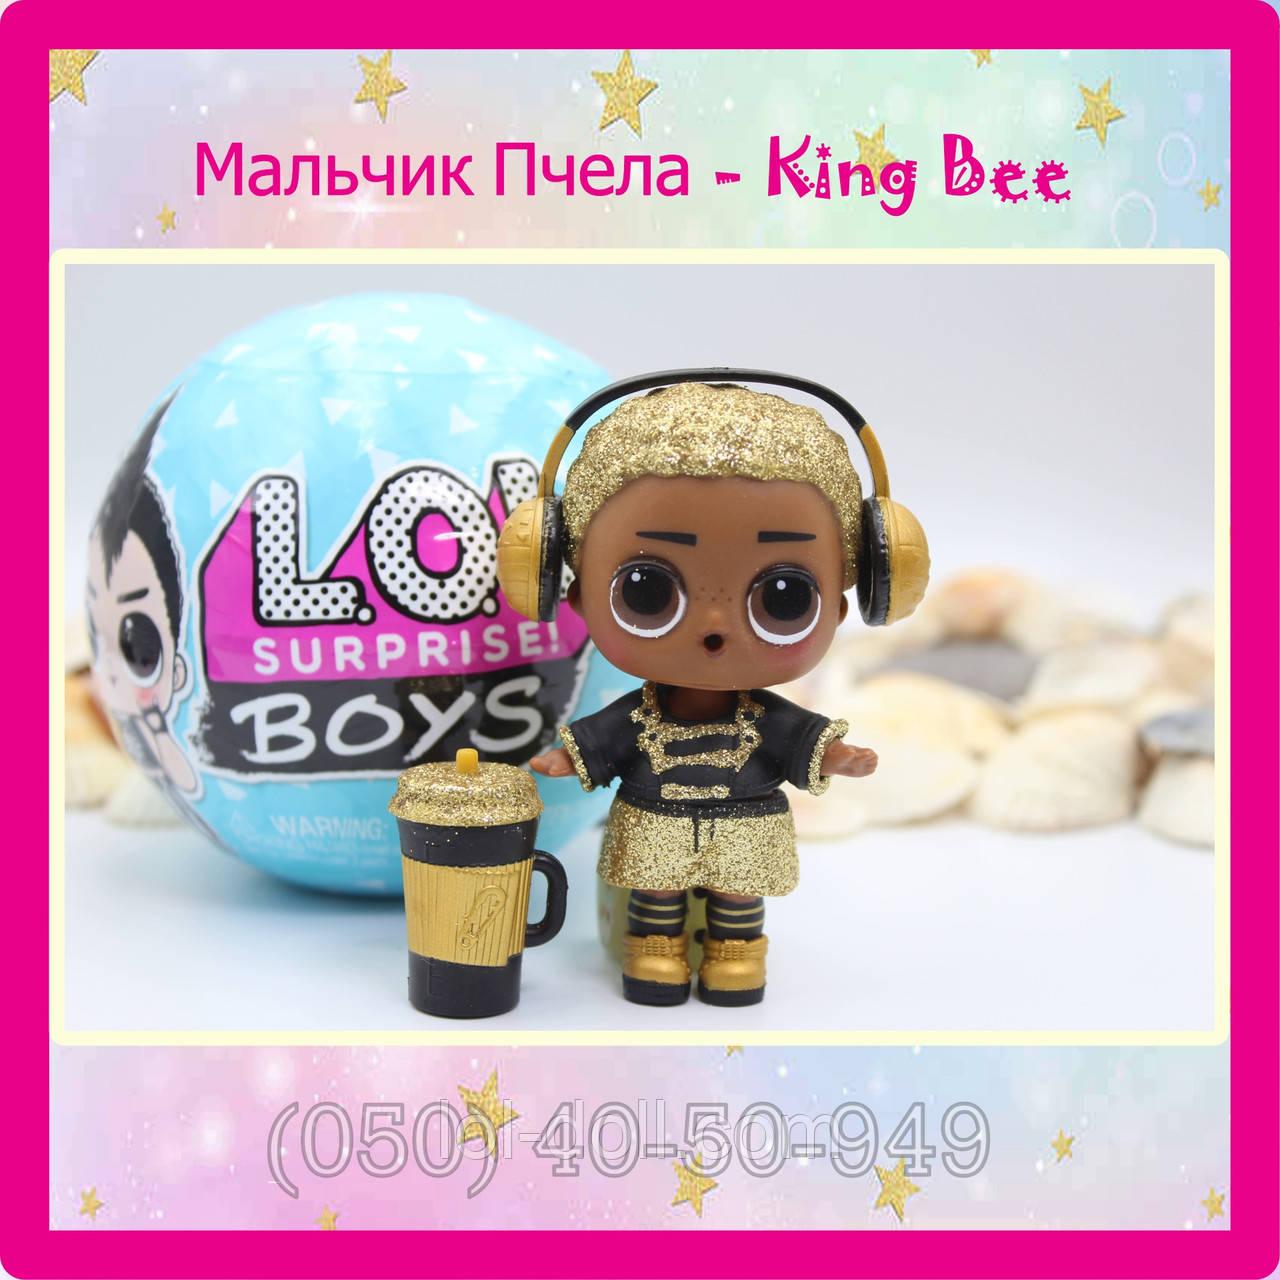 Кукла Лол Сюрприз Cерия Мальчик Пчела - King Bee LOL Surprise Оригинал